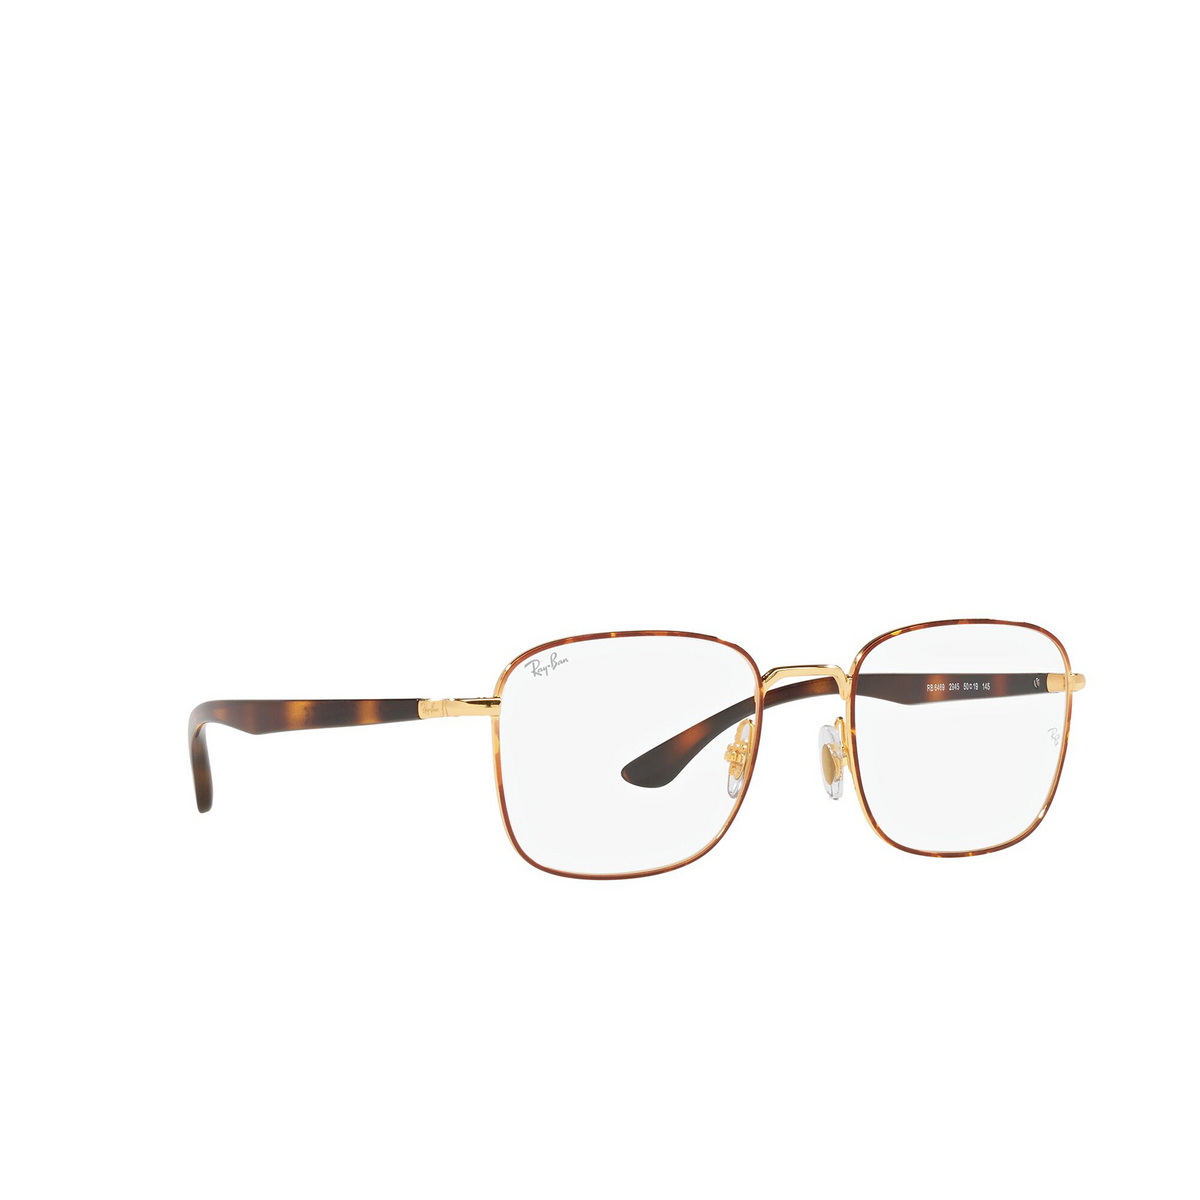 Ray-Ban® Square Eyeglasses: RX6469 color Havana On Arista 2945 - three-quarters view.